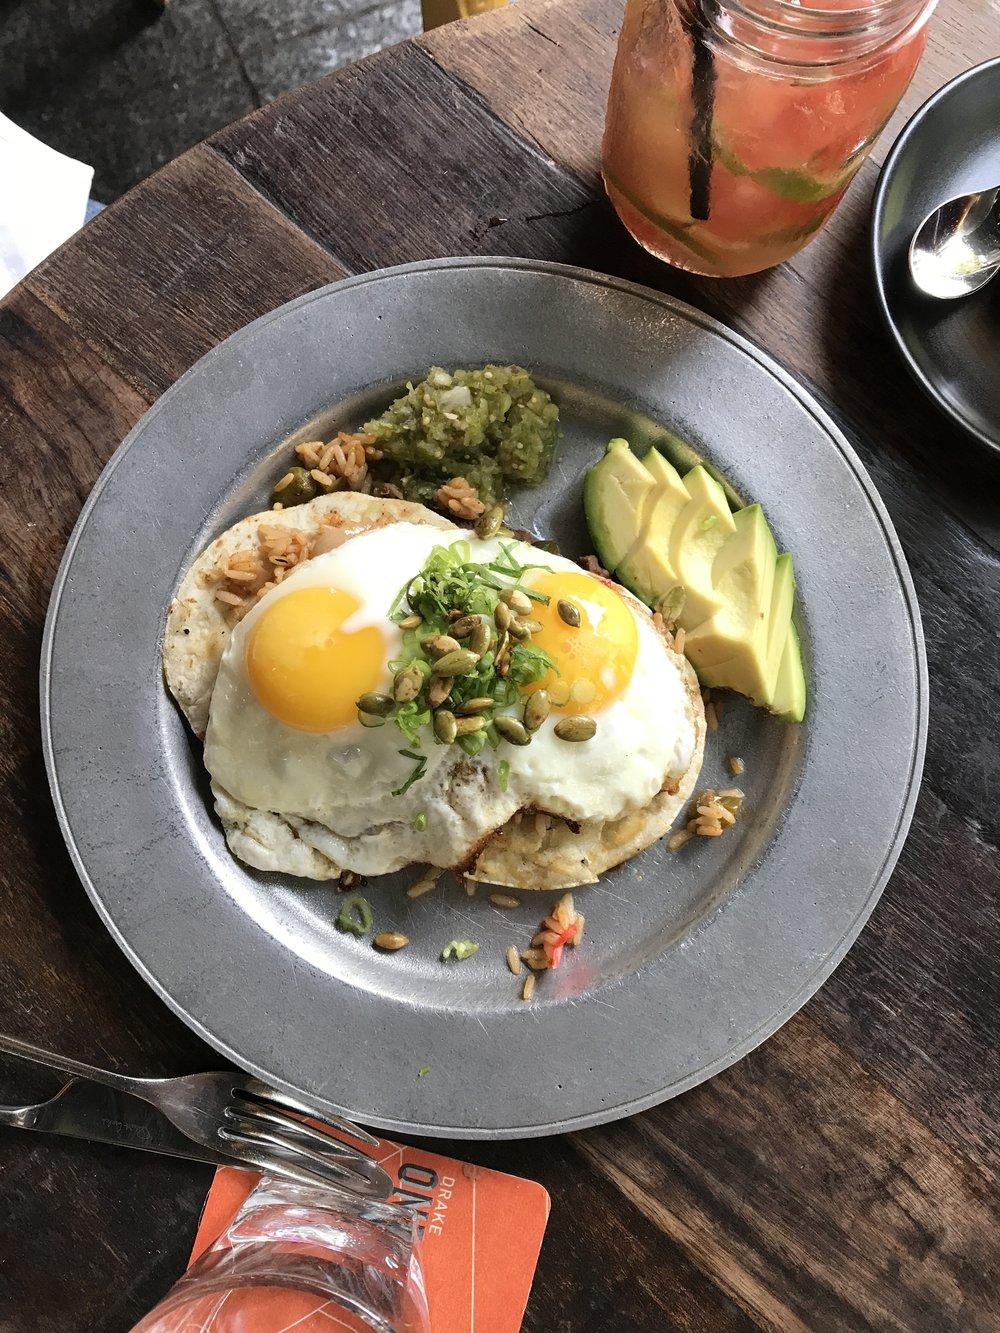 Huevos Rancheros - Refried black beans, sunny side up eggs, chili spiced rice,avocado, tomatillo salsa